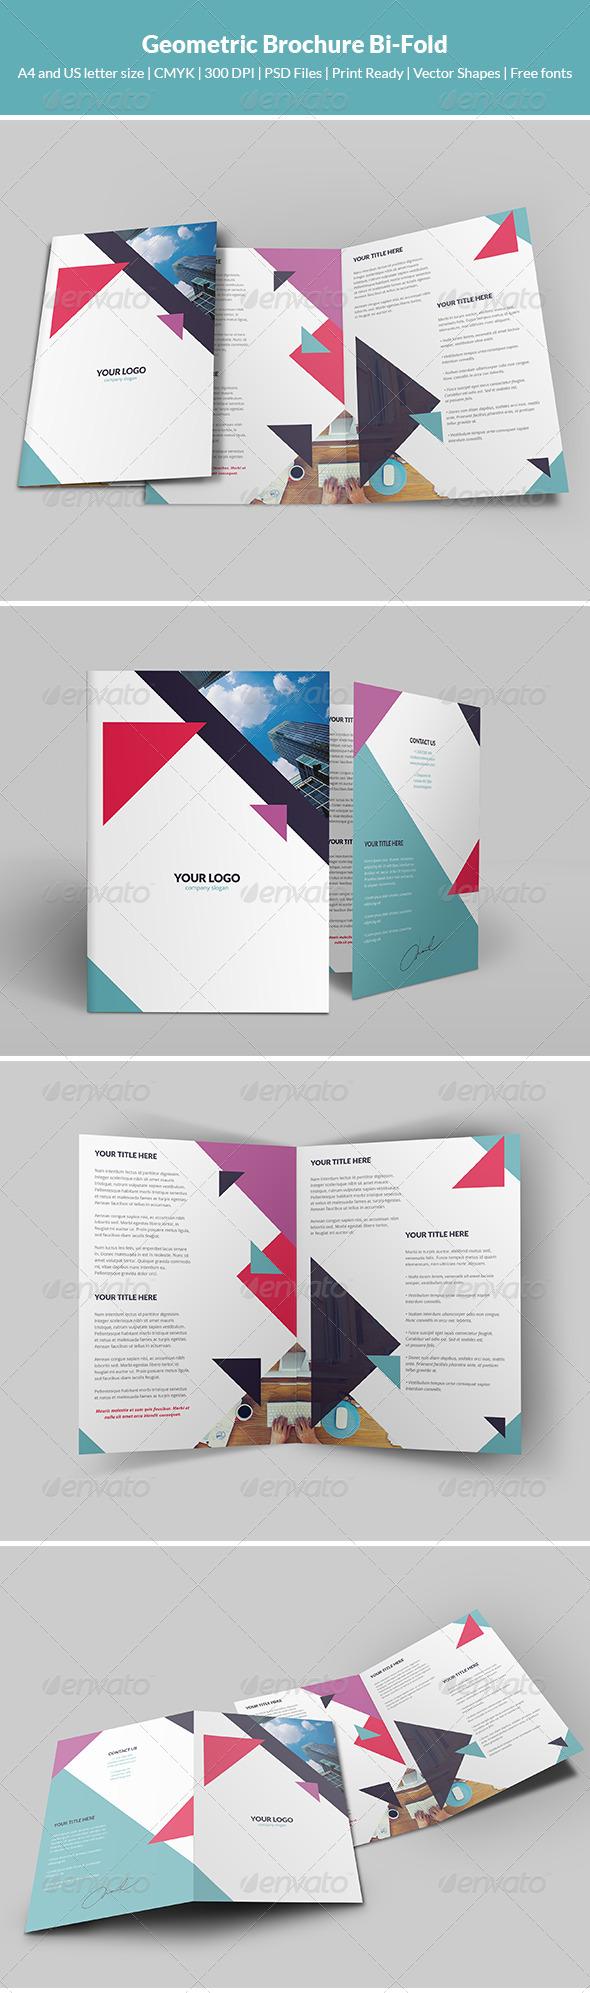 GraphicRiver Geometric Brochure Bi-Fold 7791917